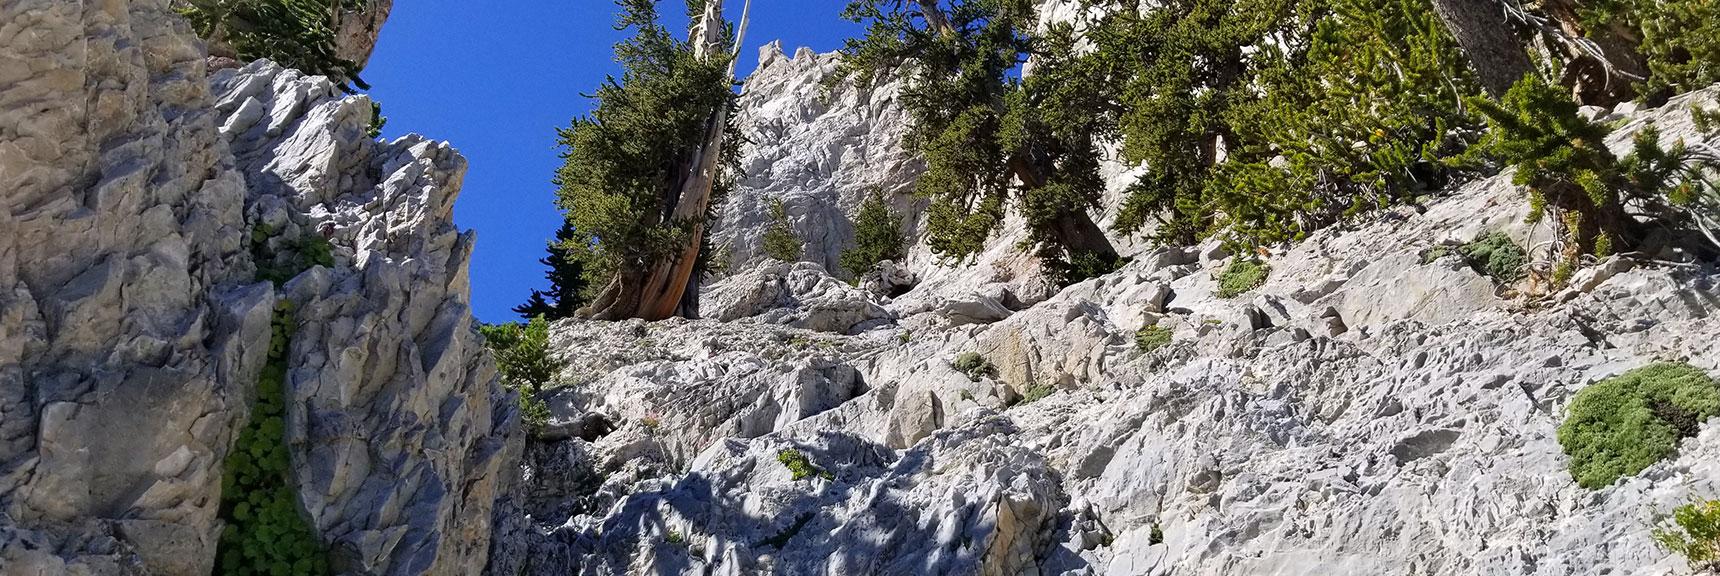 Heading Up Mummy's False Summit Approach Canyon, Nevada